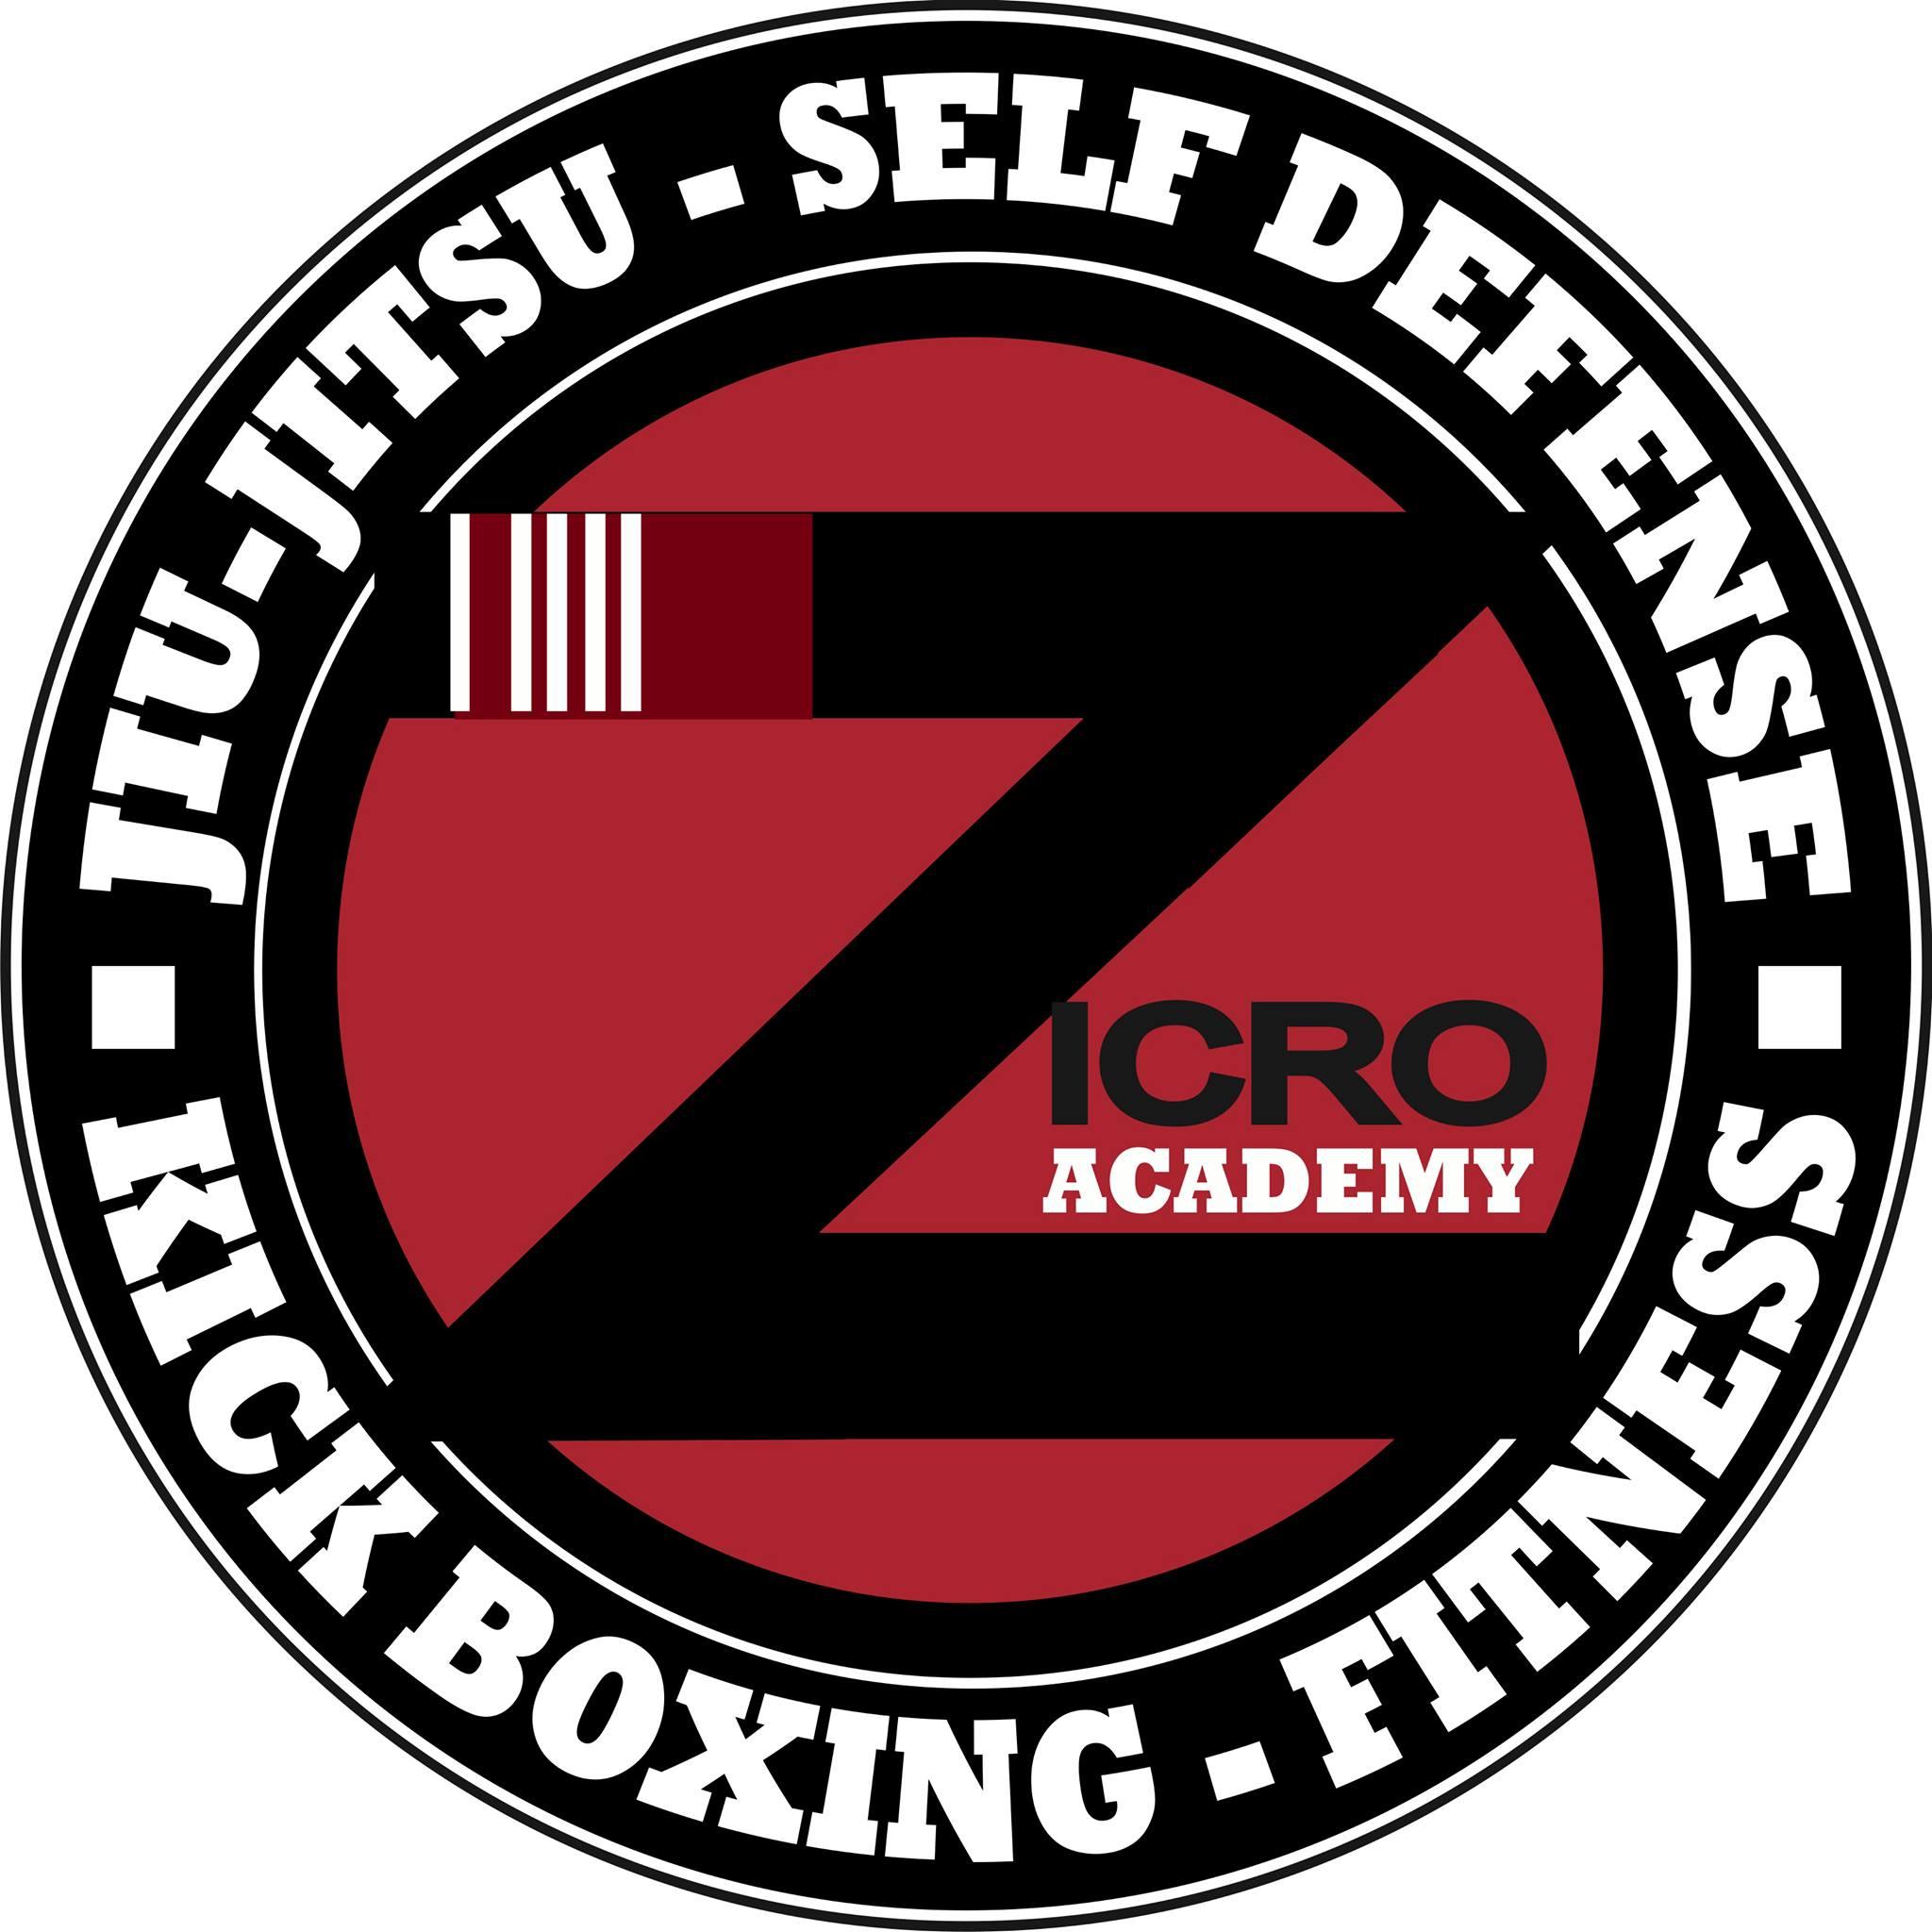 Zicro Academy Alliance Tallahassee